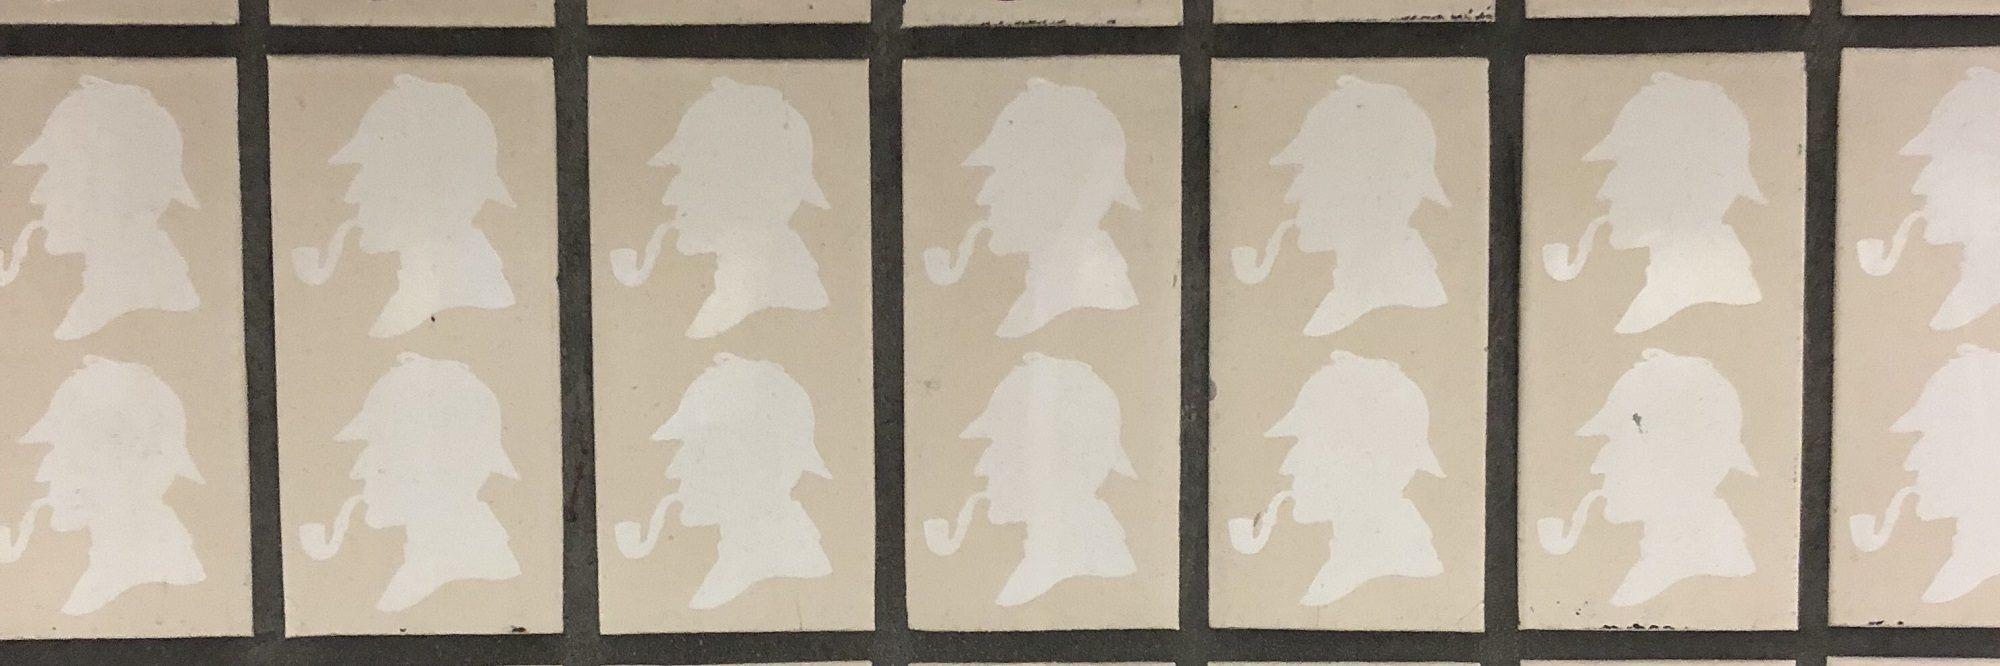 Sherlock-Holmes-FRENCH-1-2000x666